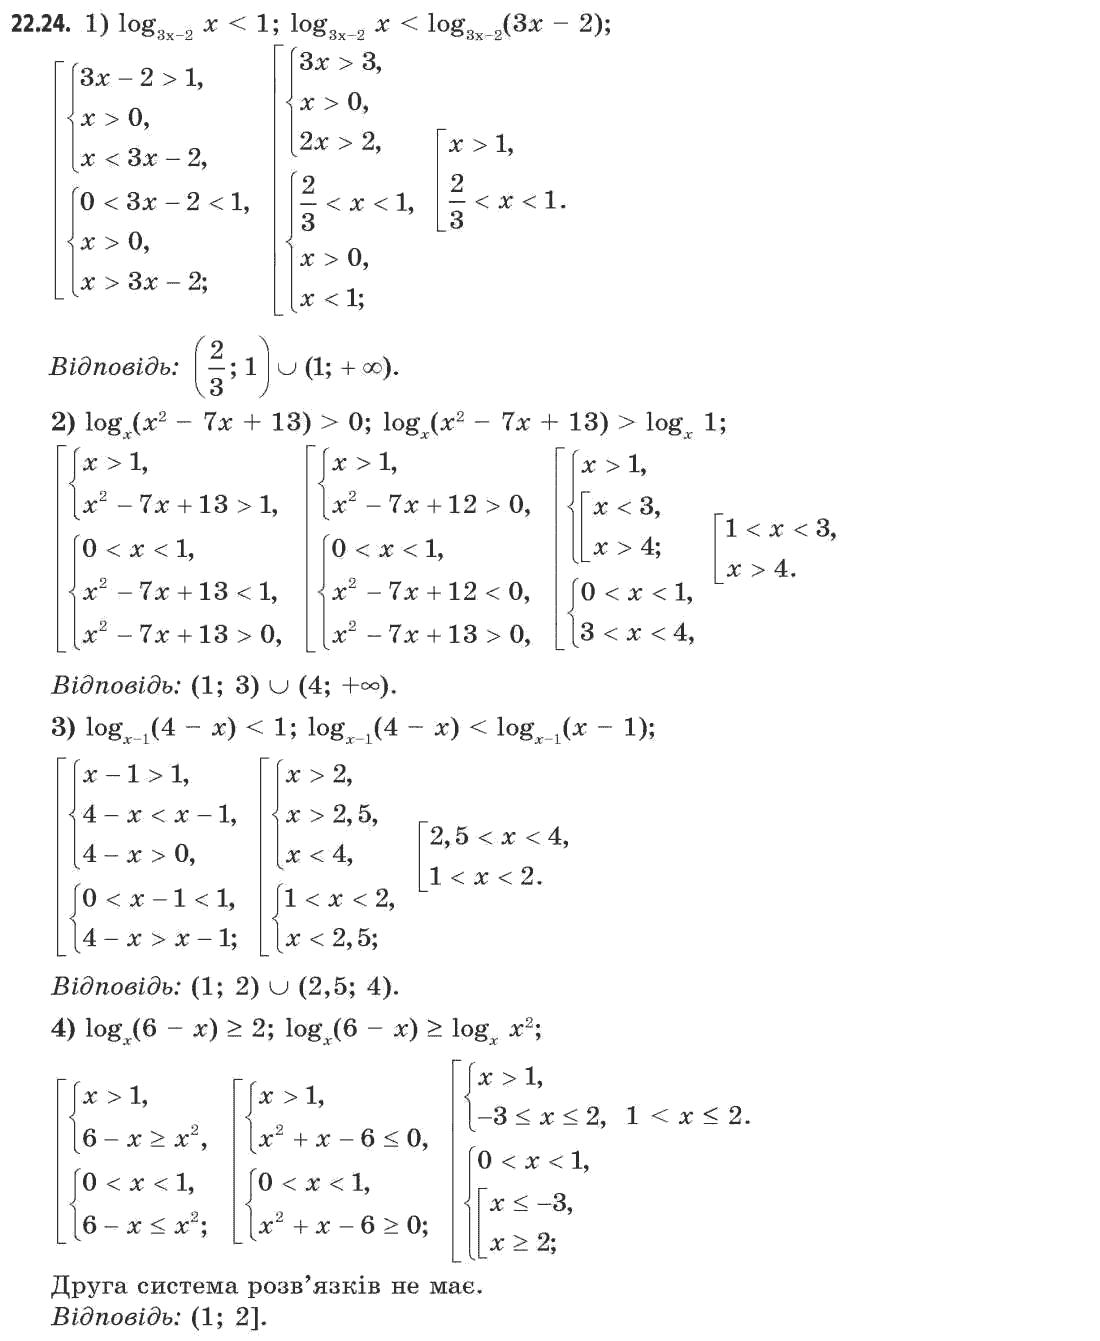 мерзляк рівень алгебра гдз а.г. профільний